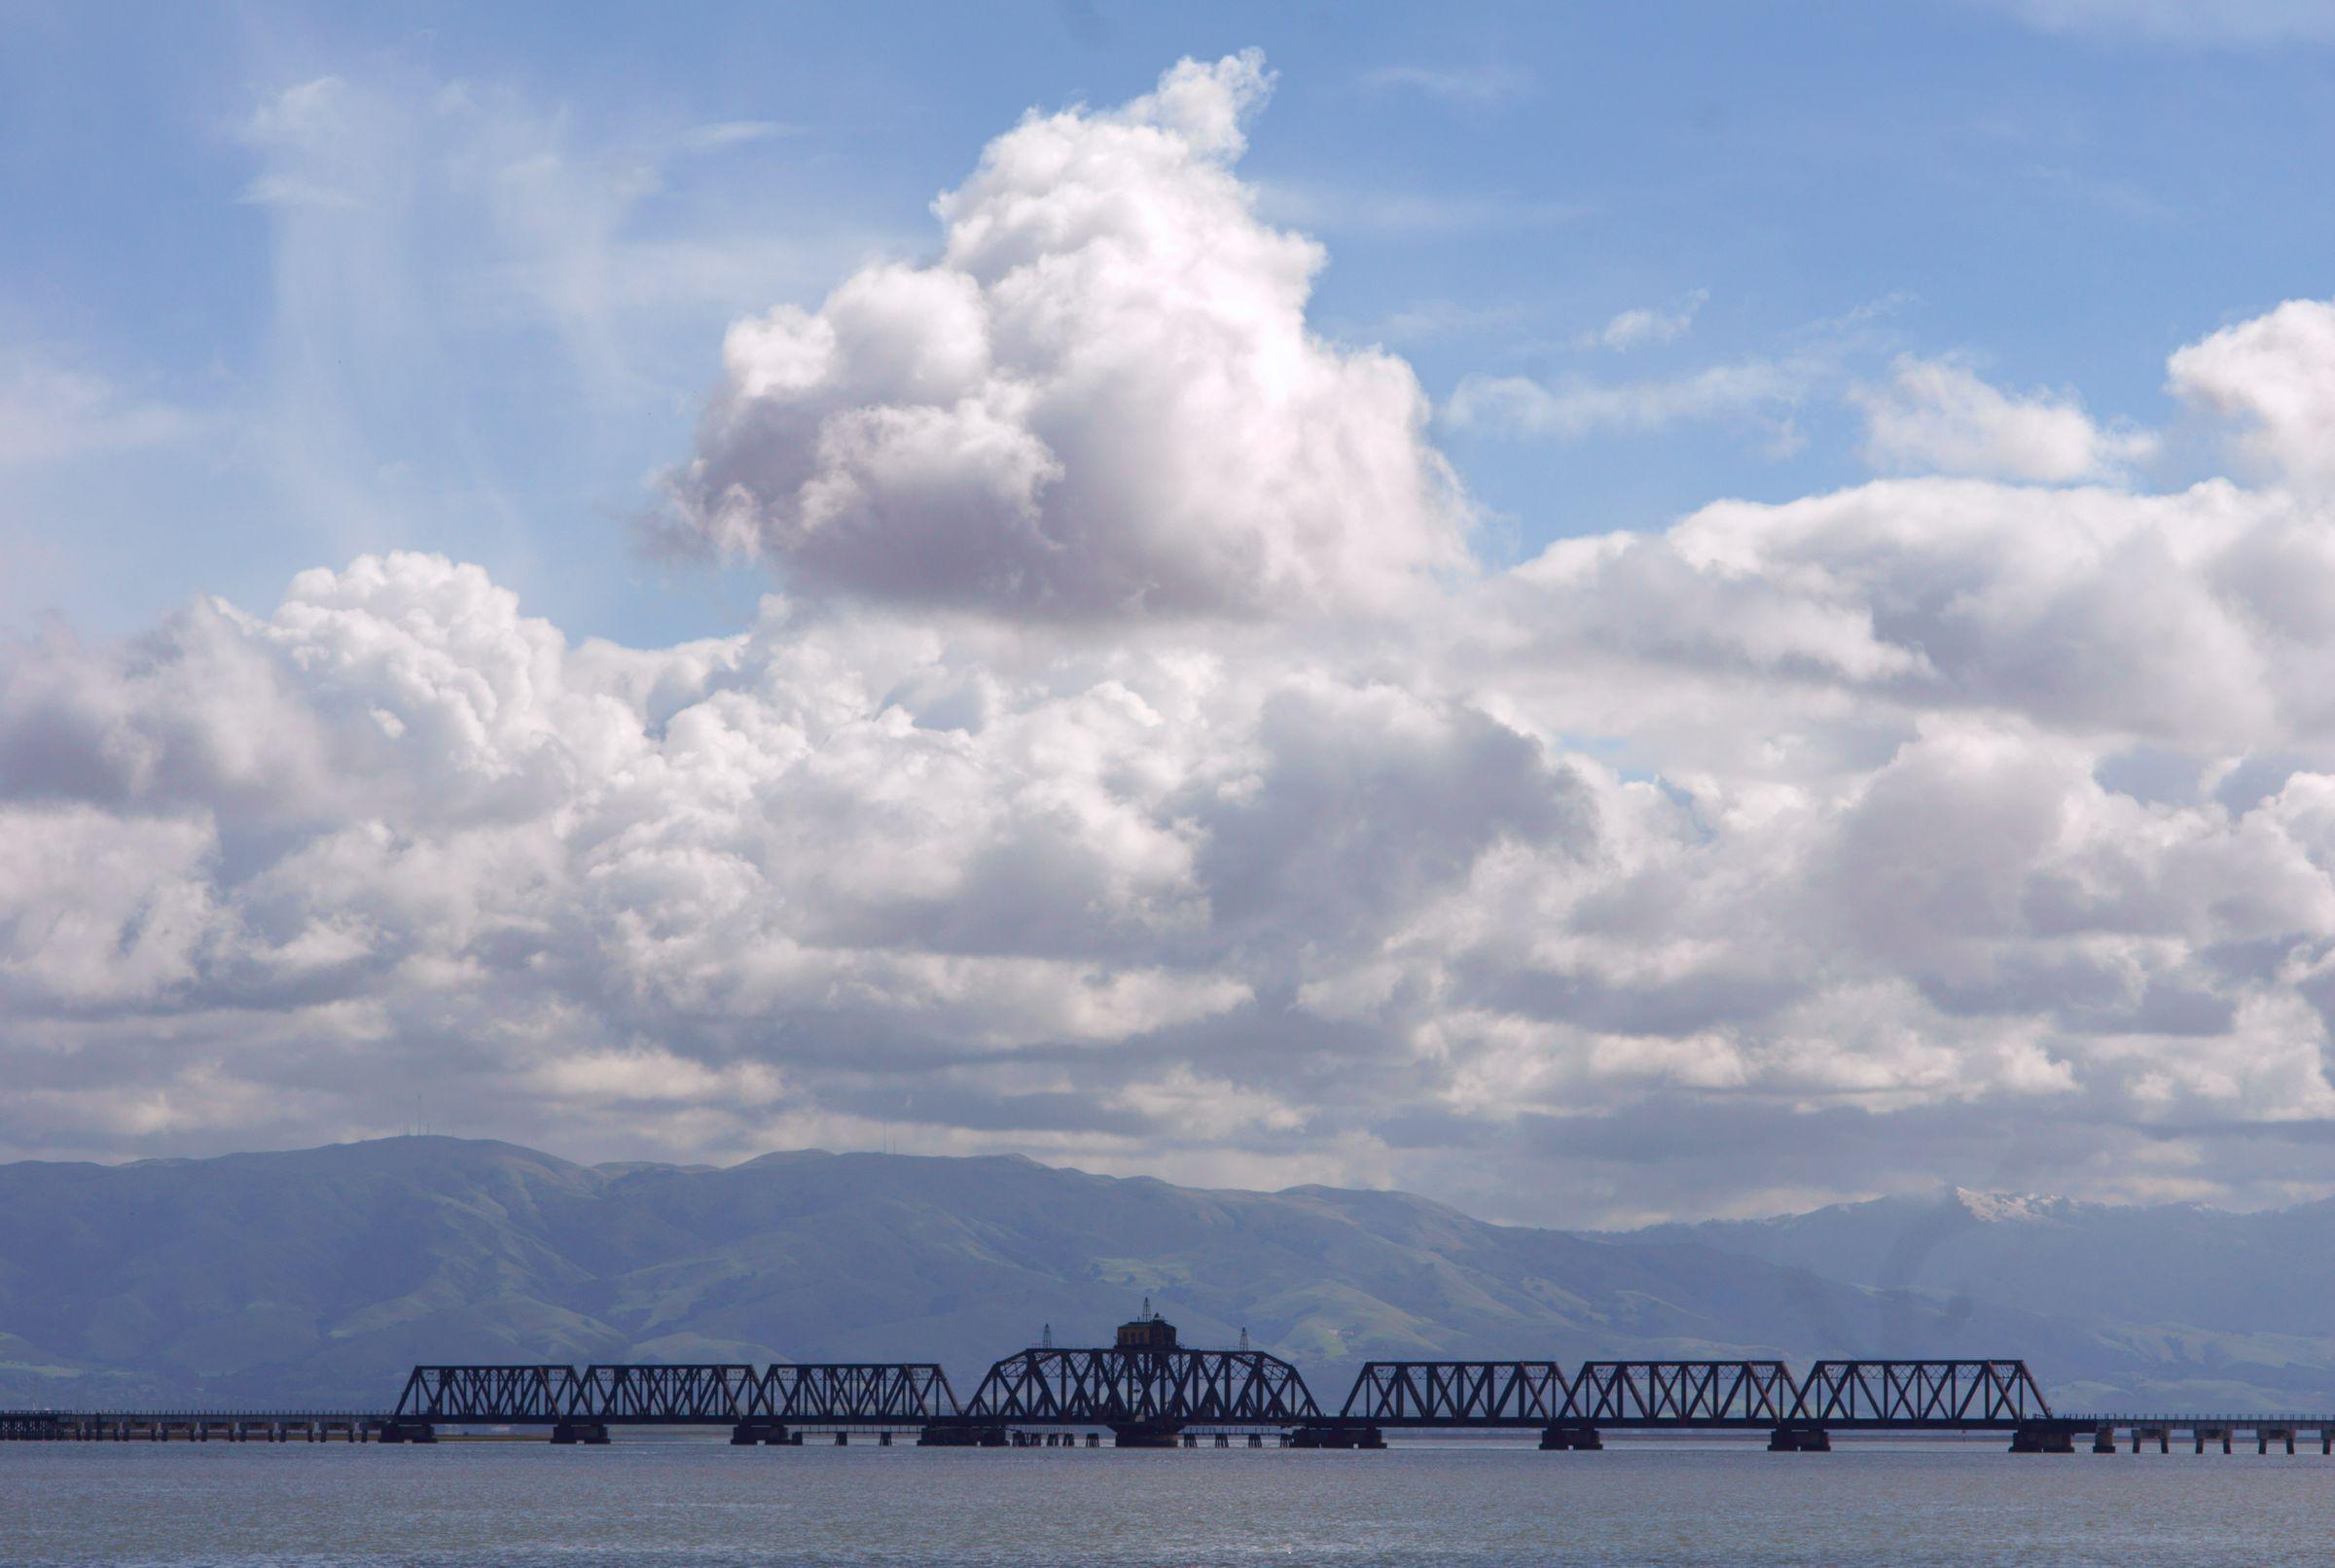 Train Bridge, San Francisco Bay